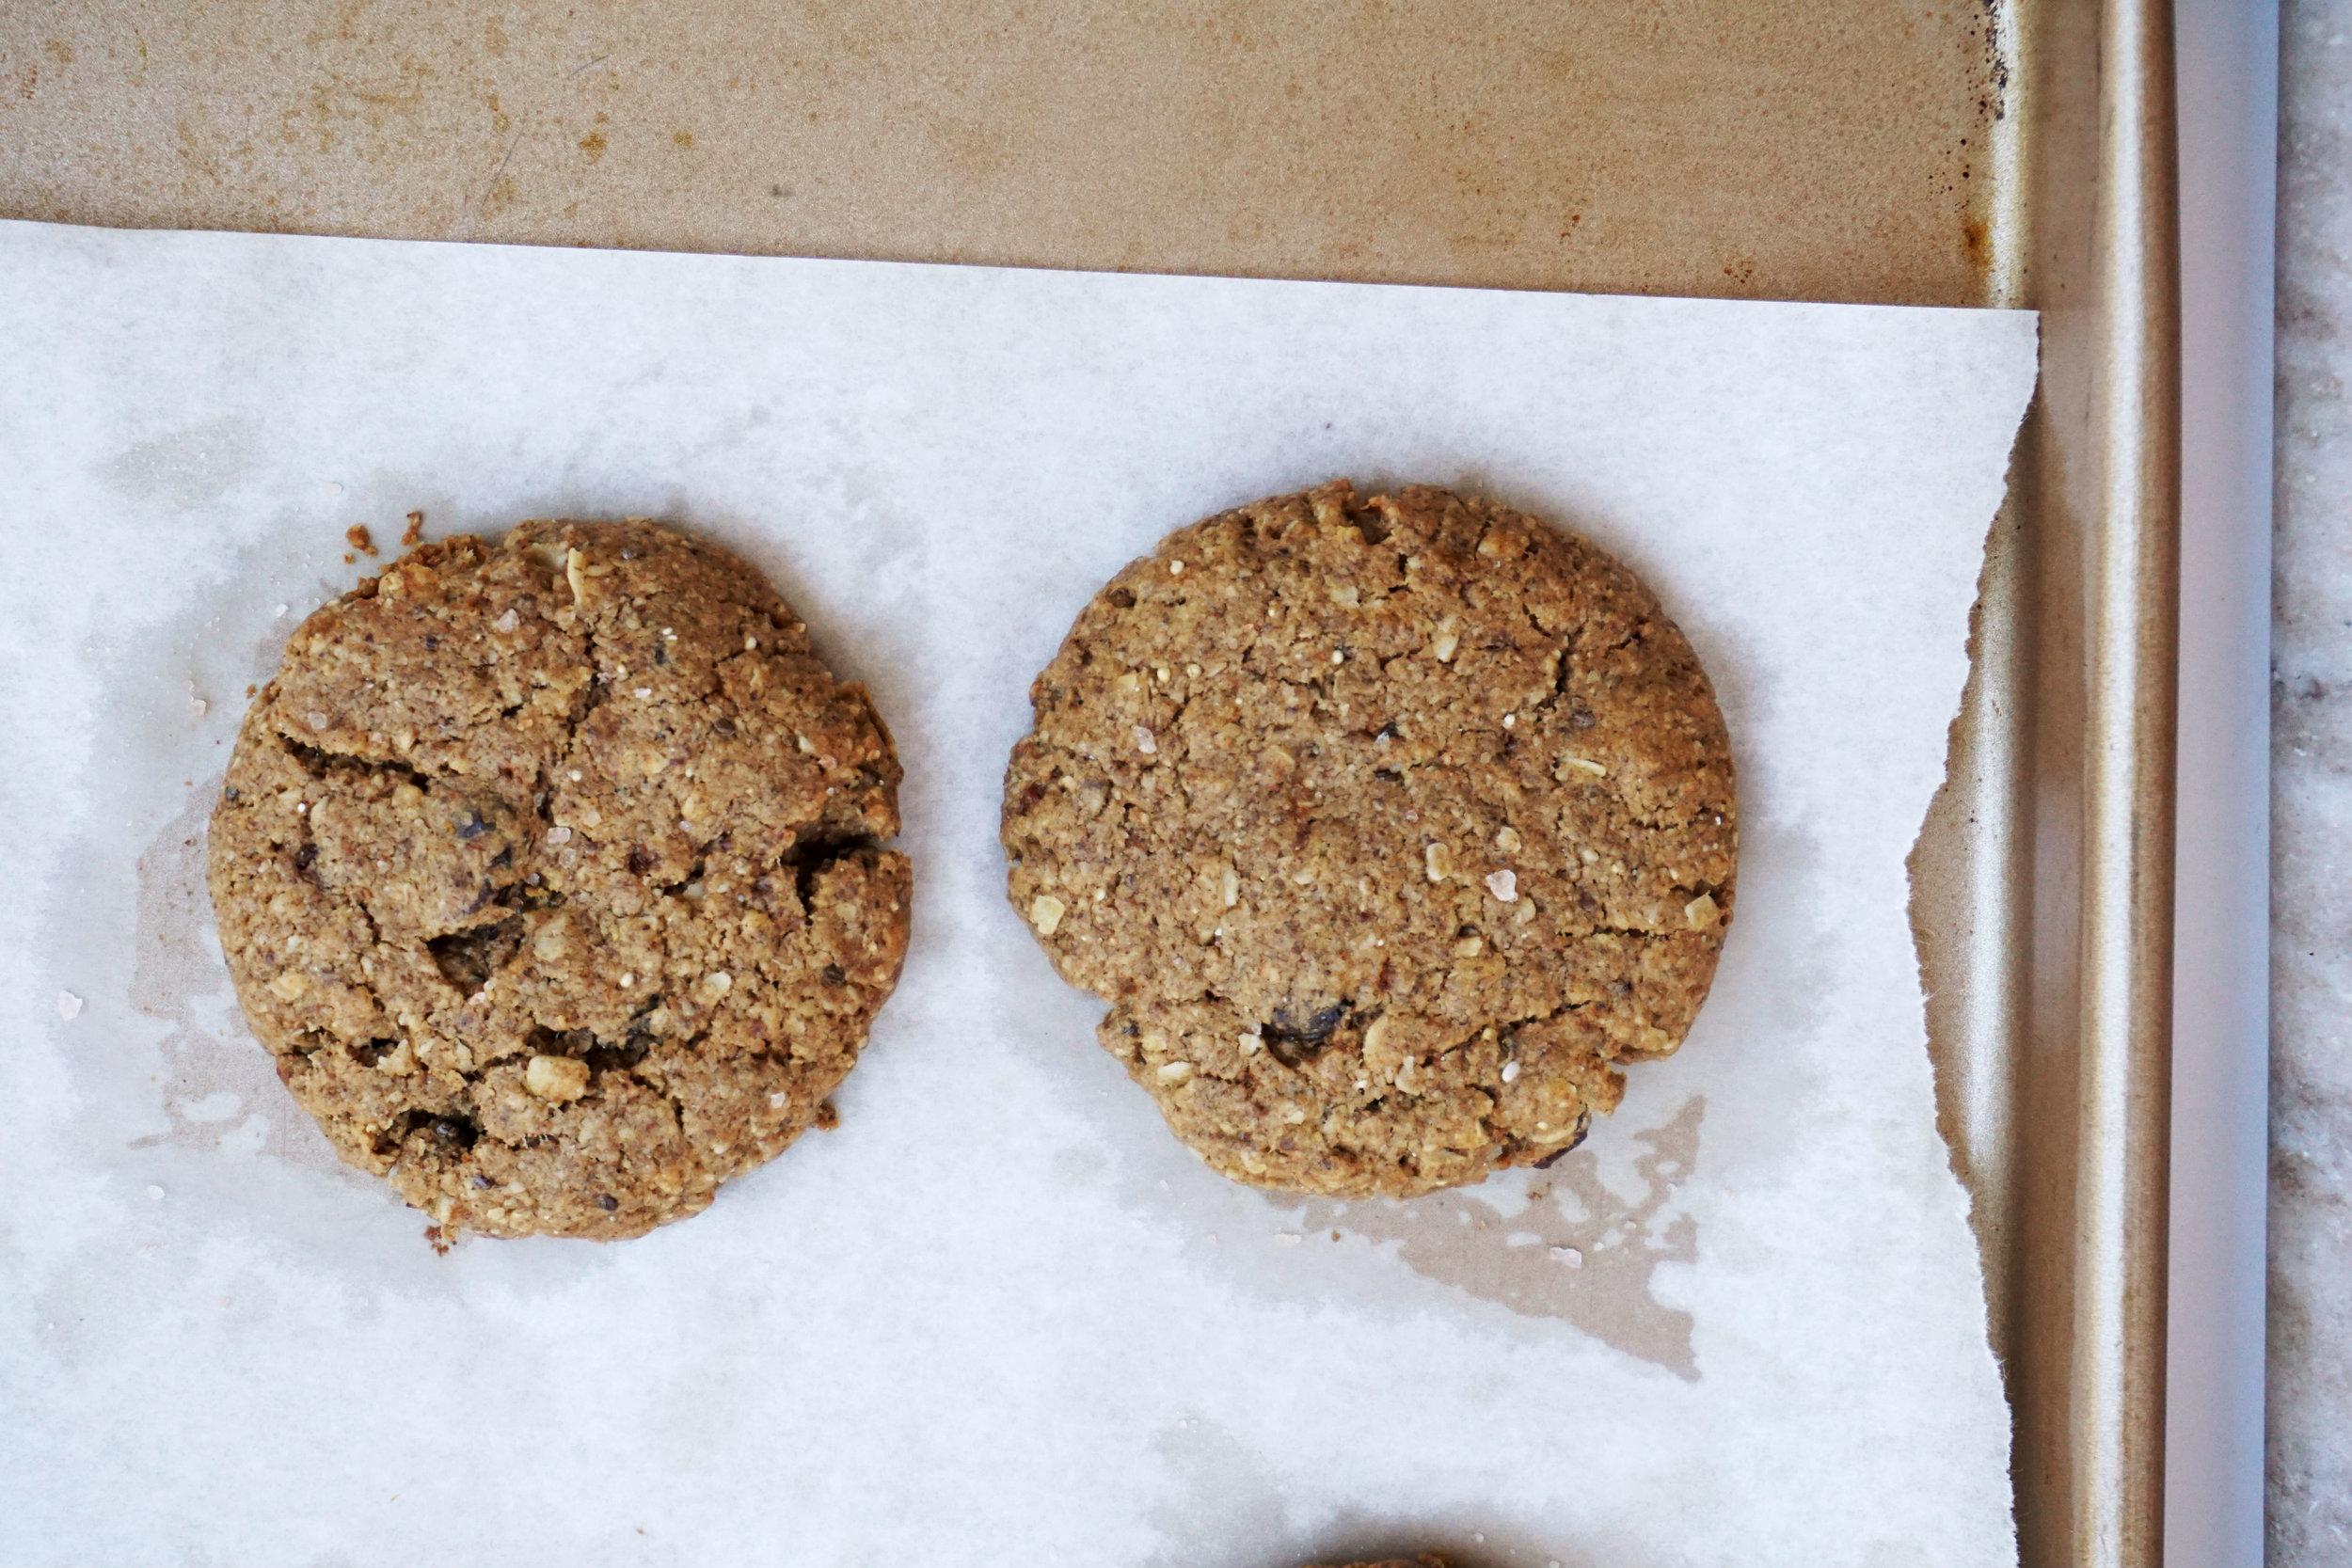 Almond Butter Oatmeal Raisin Cookie Ice Cream Sandwiches (Vegan, GF)